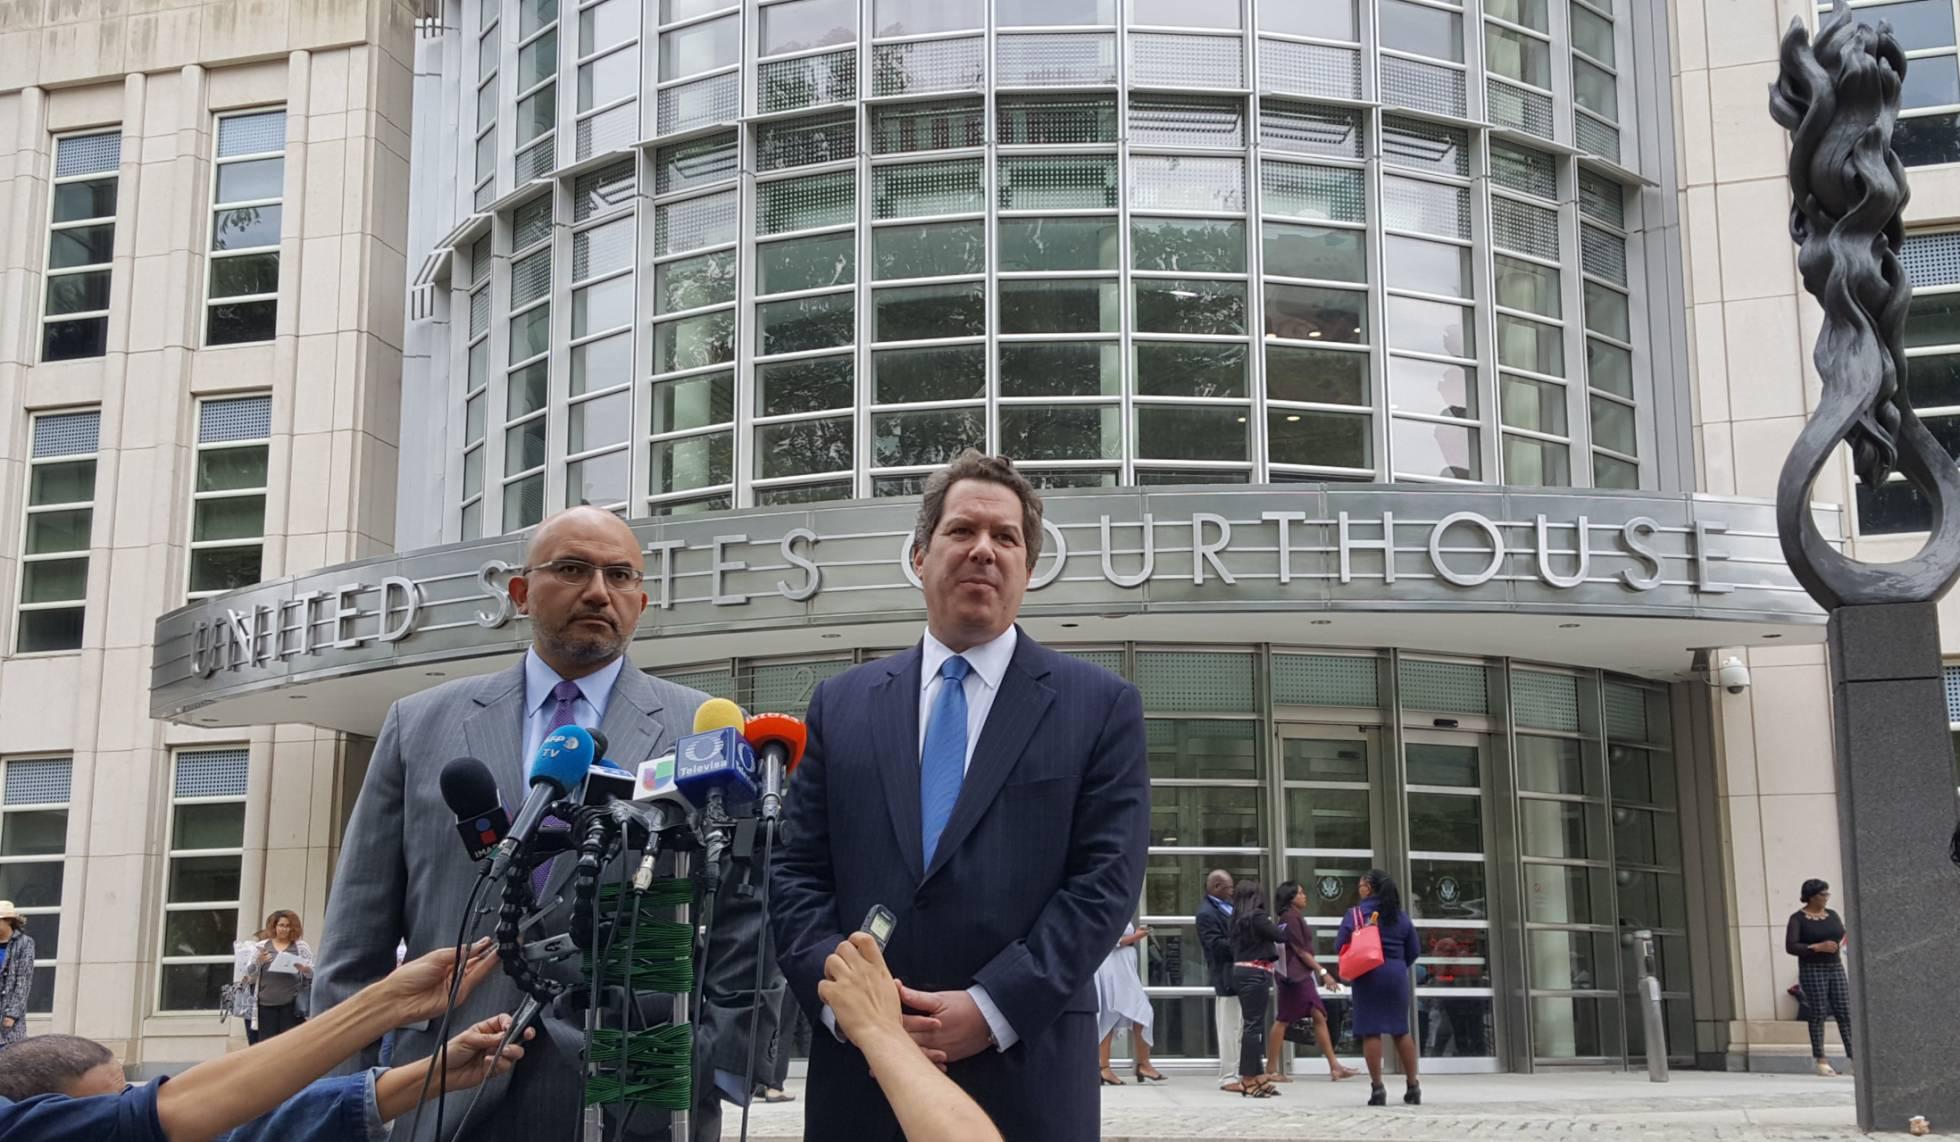 El abogado del mafioso Gotti se suma a la defensa de El Chapo